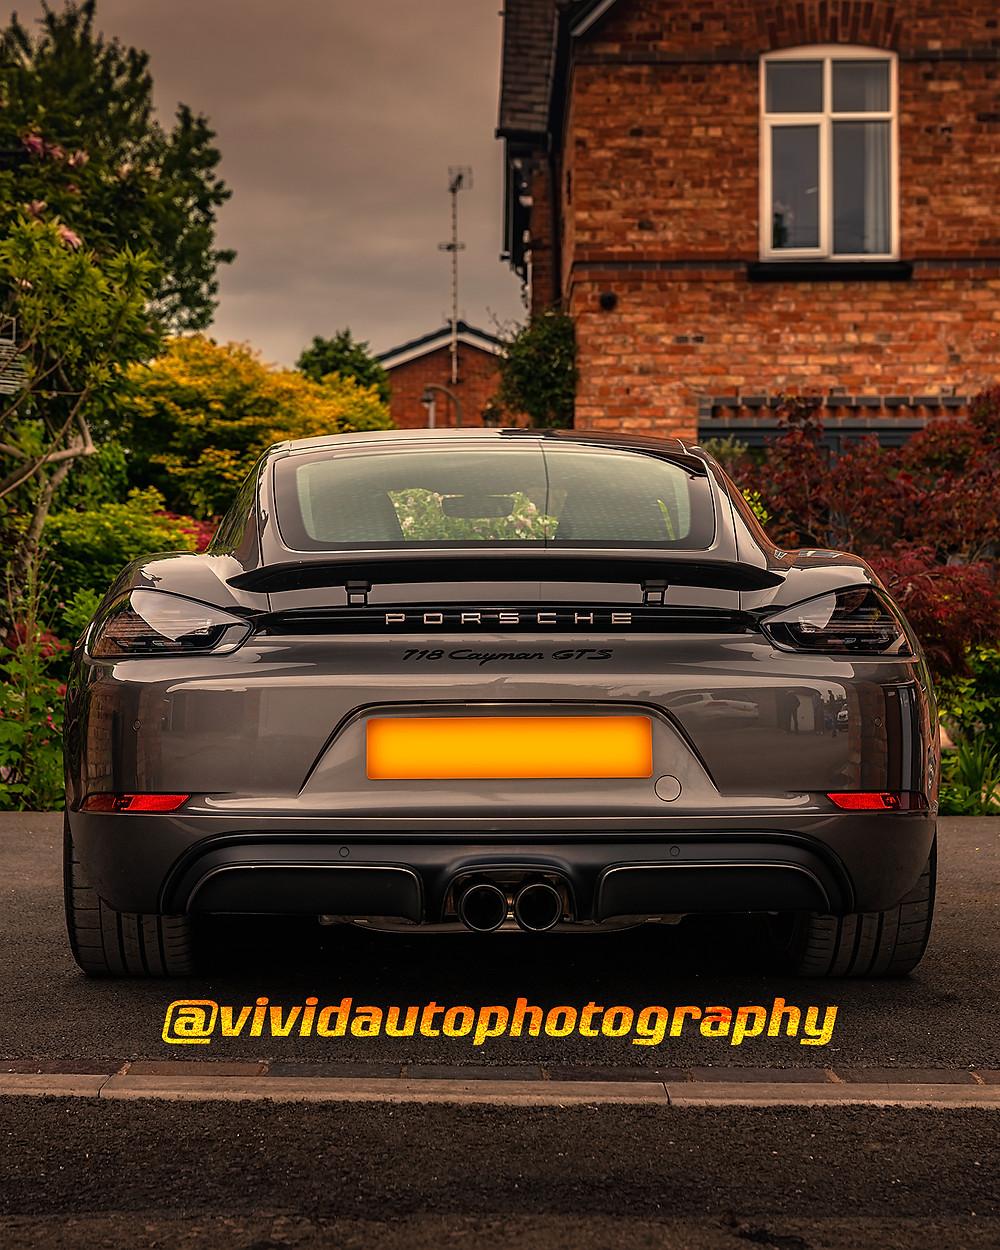 Porsche 718 Cayman GTS rear poster | Agate Grey